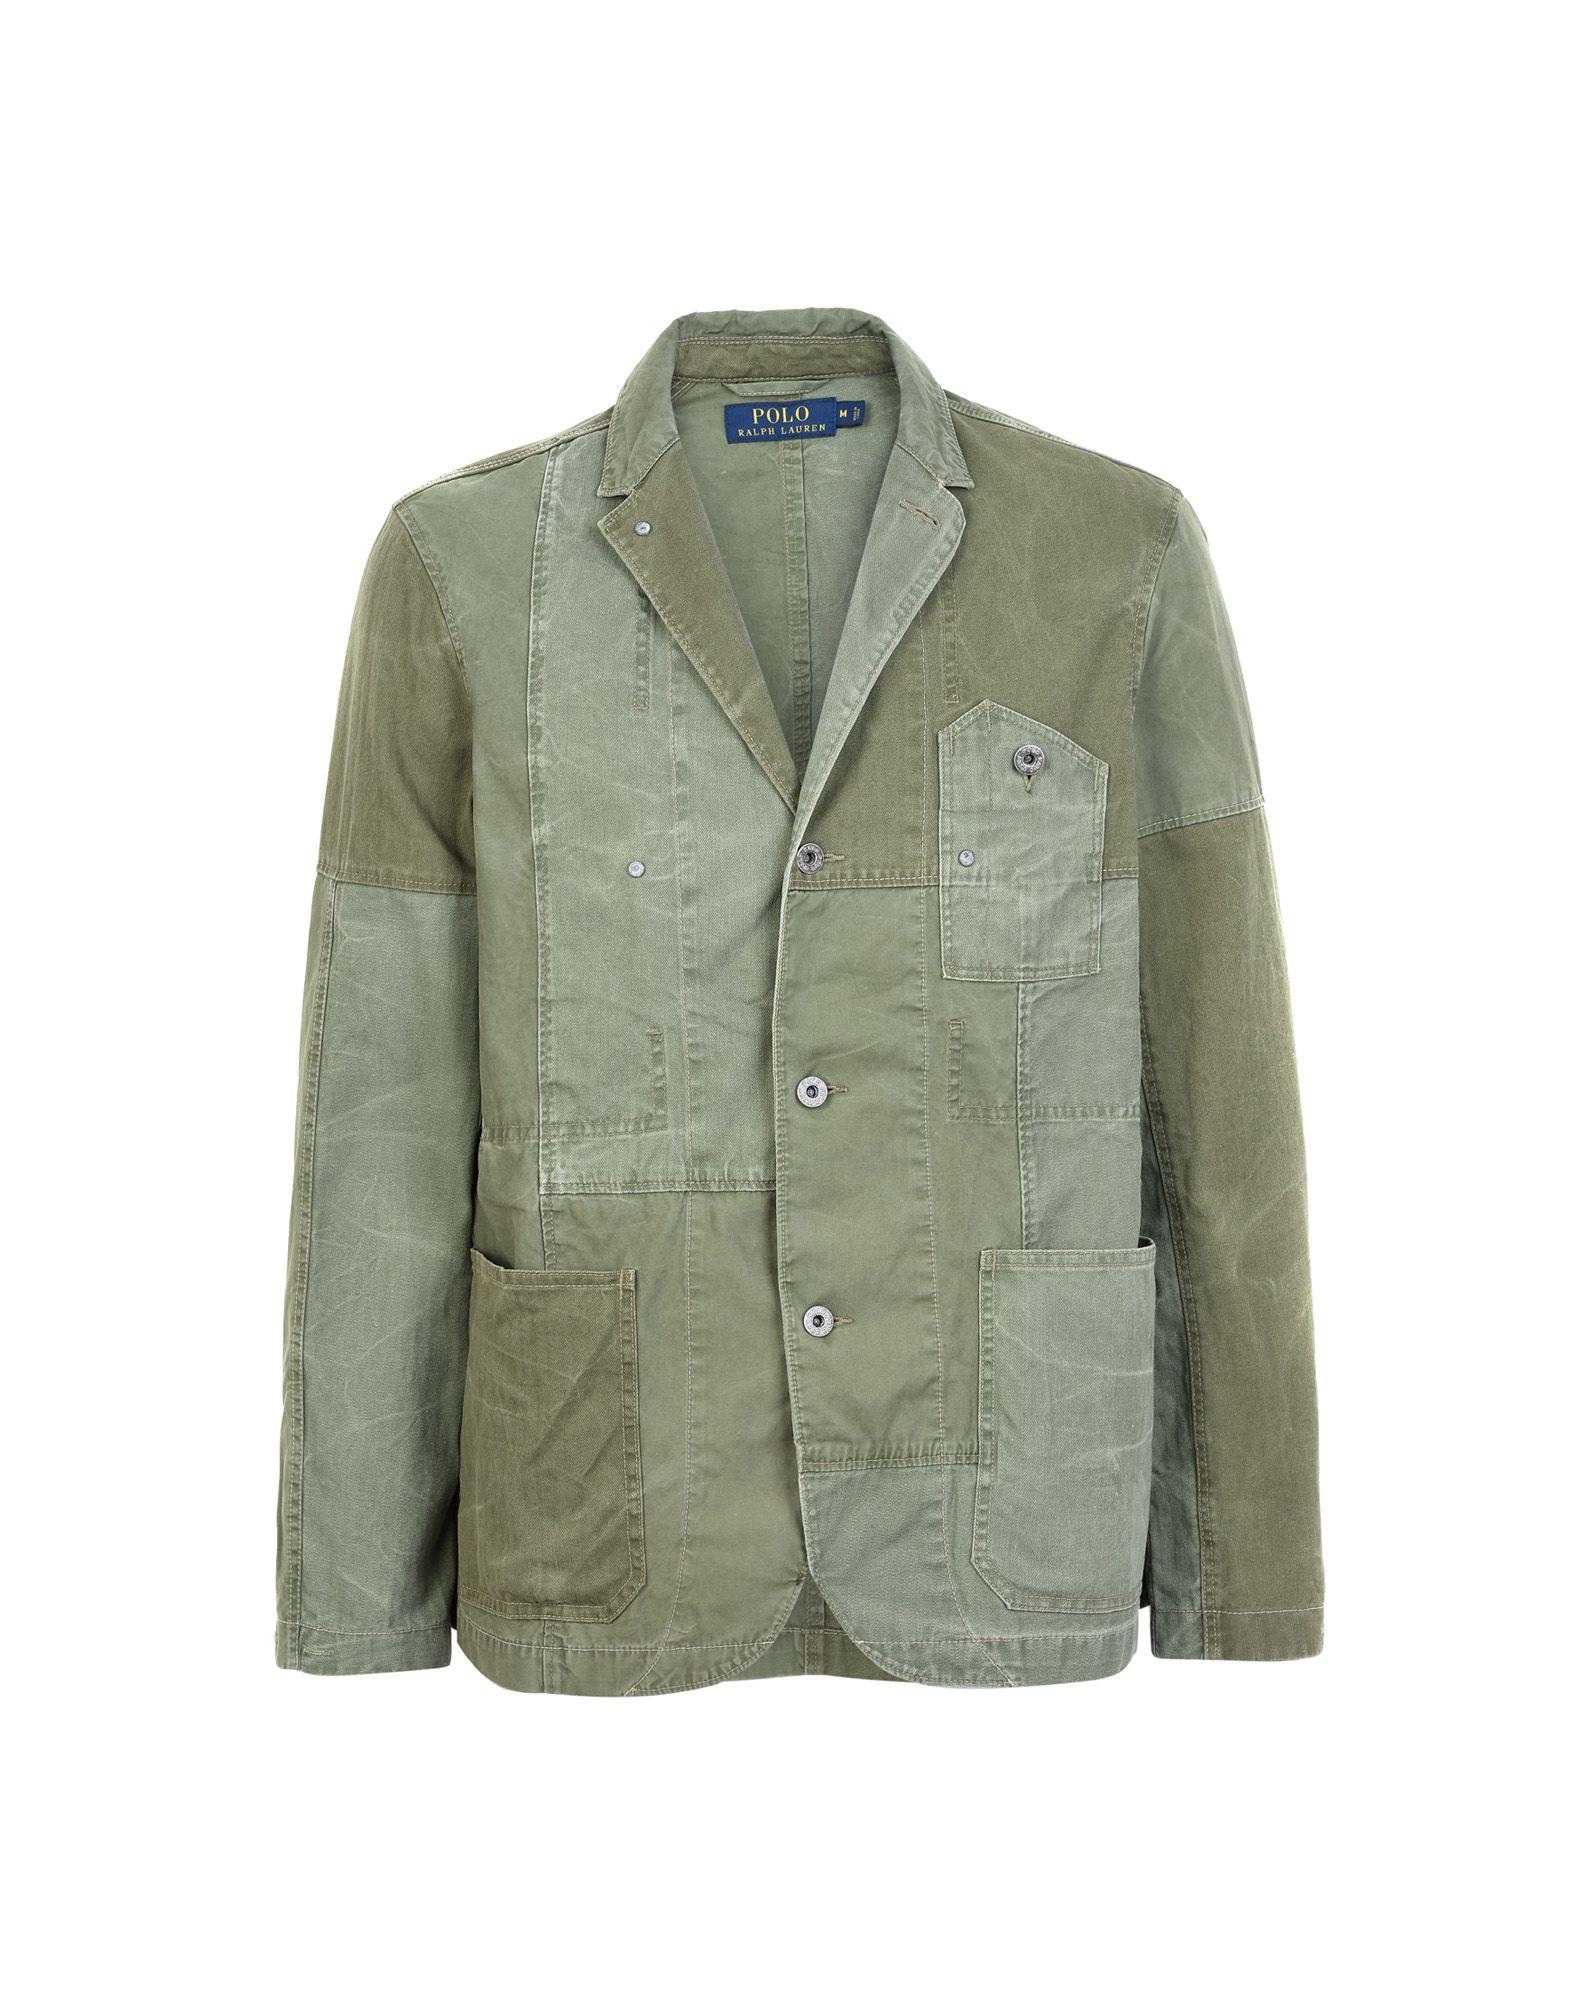 Giacca Polo Ralph Lauren Patchwork Jacket - Uomo - Acquista online su